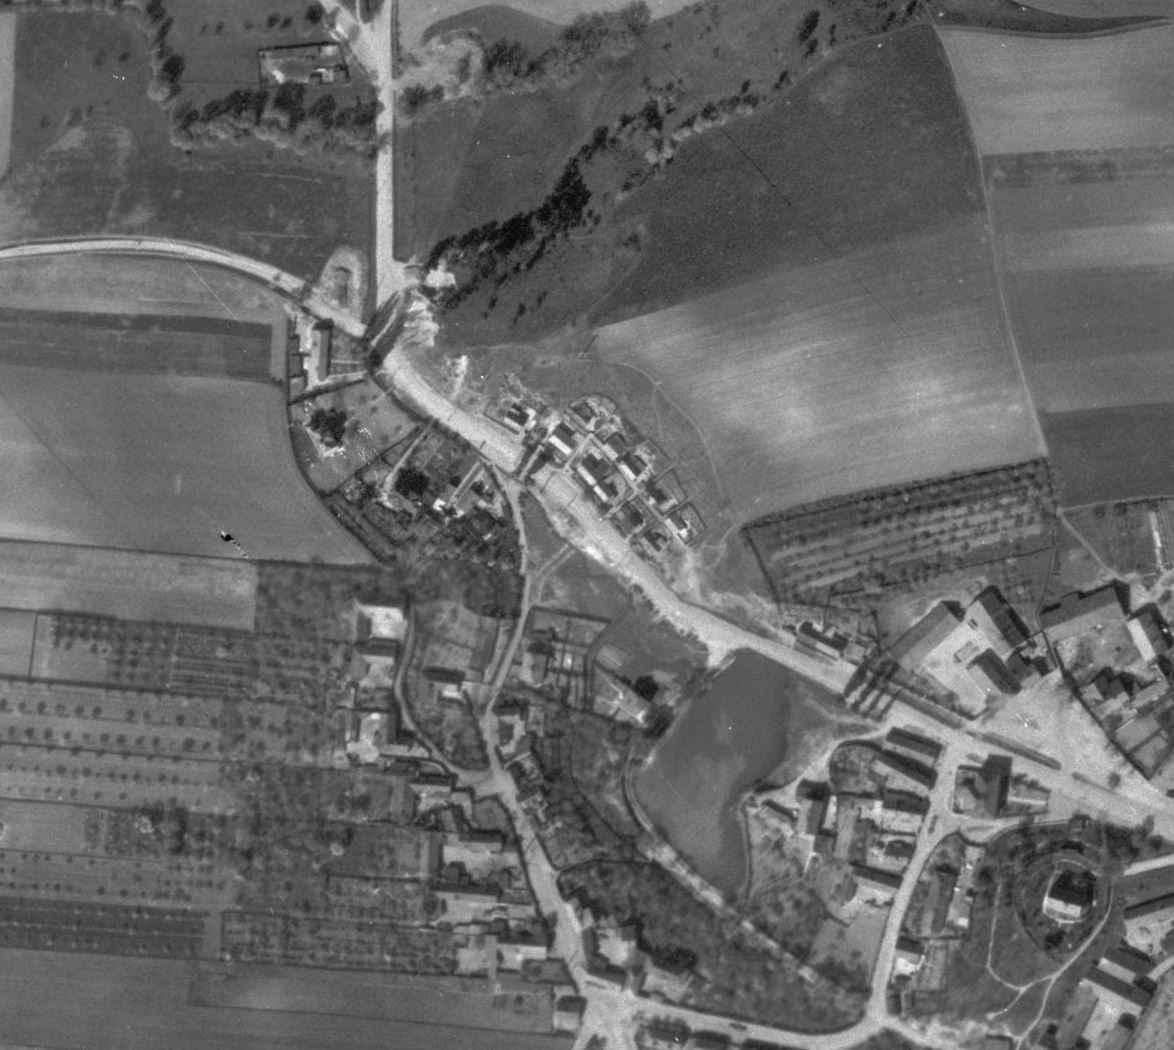 nouzova-kolonie-pod-zameckem-letecky-snimek-1945